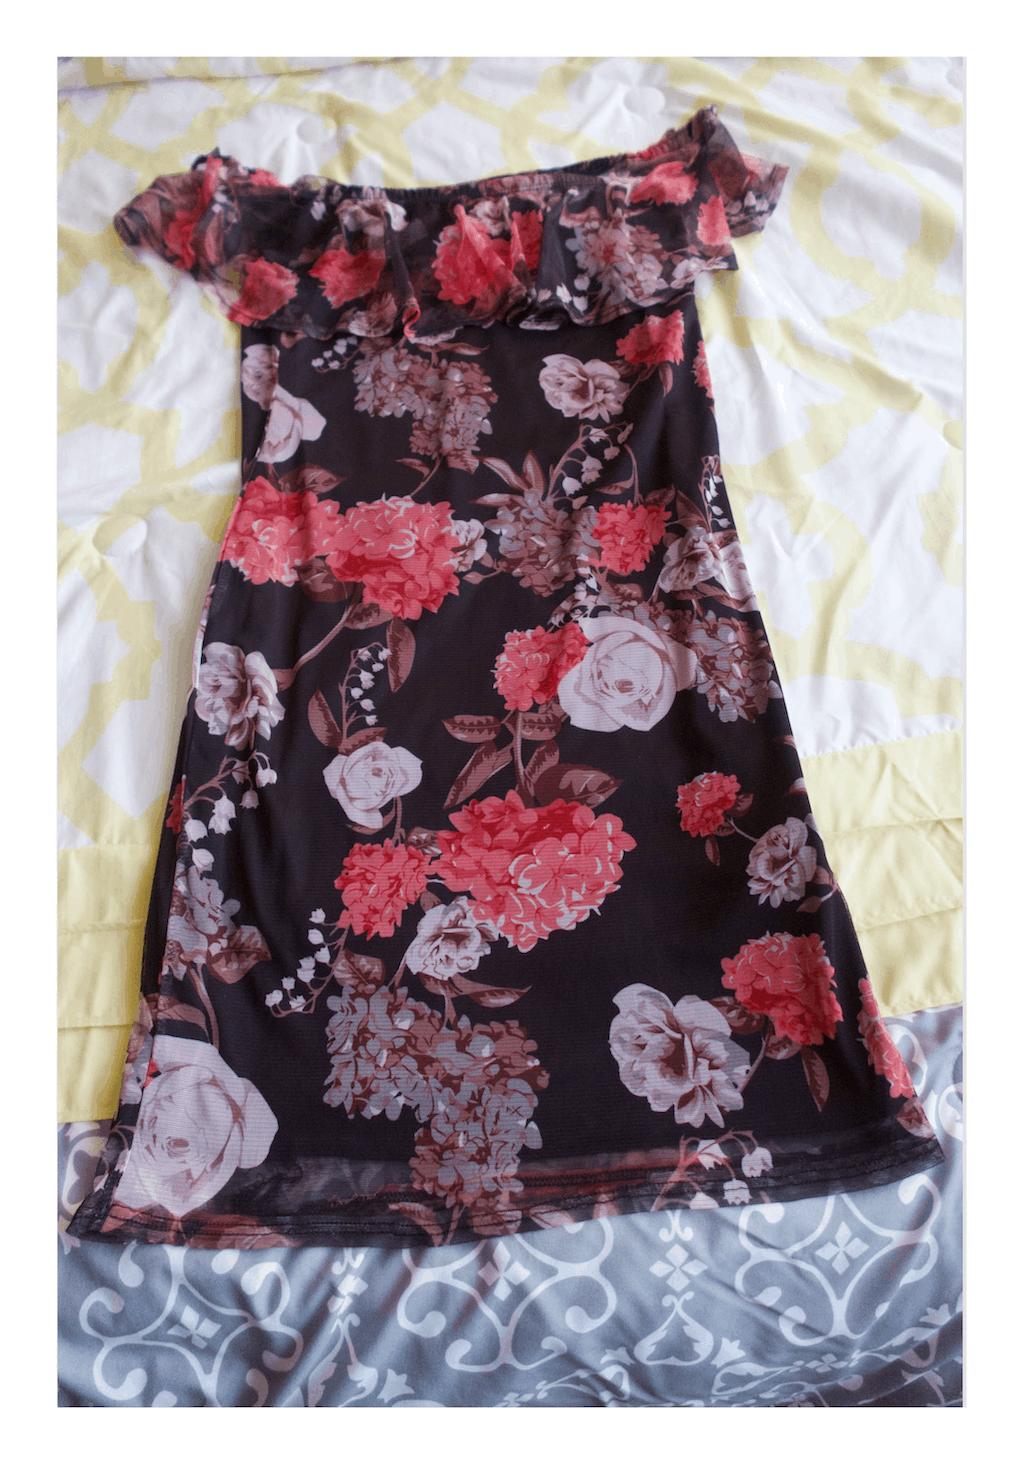 my birthday gift: black floral dress